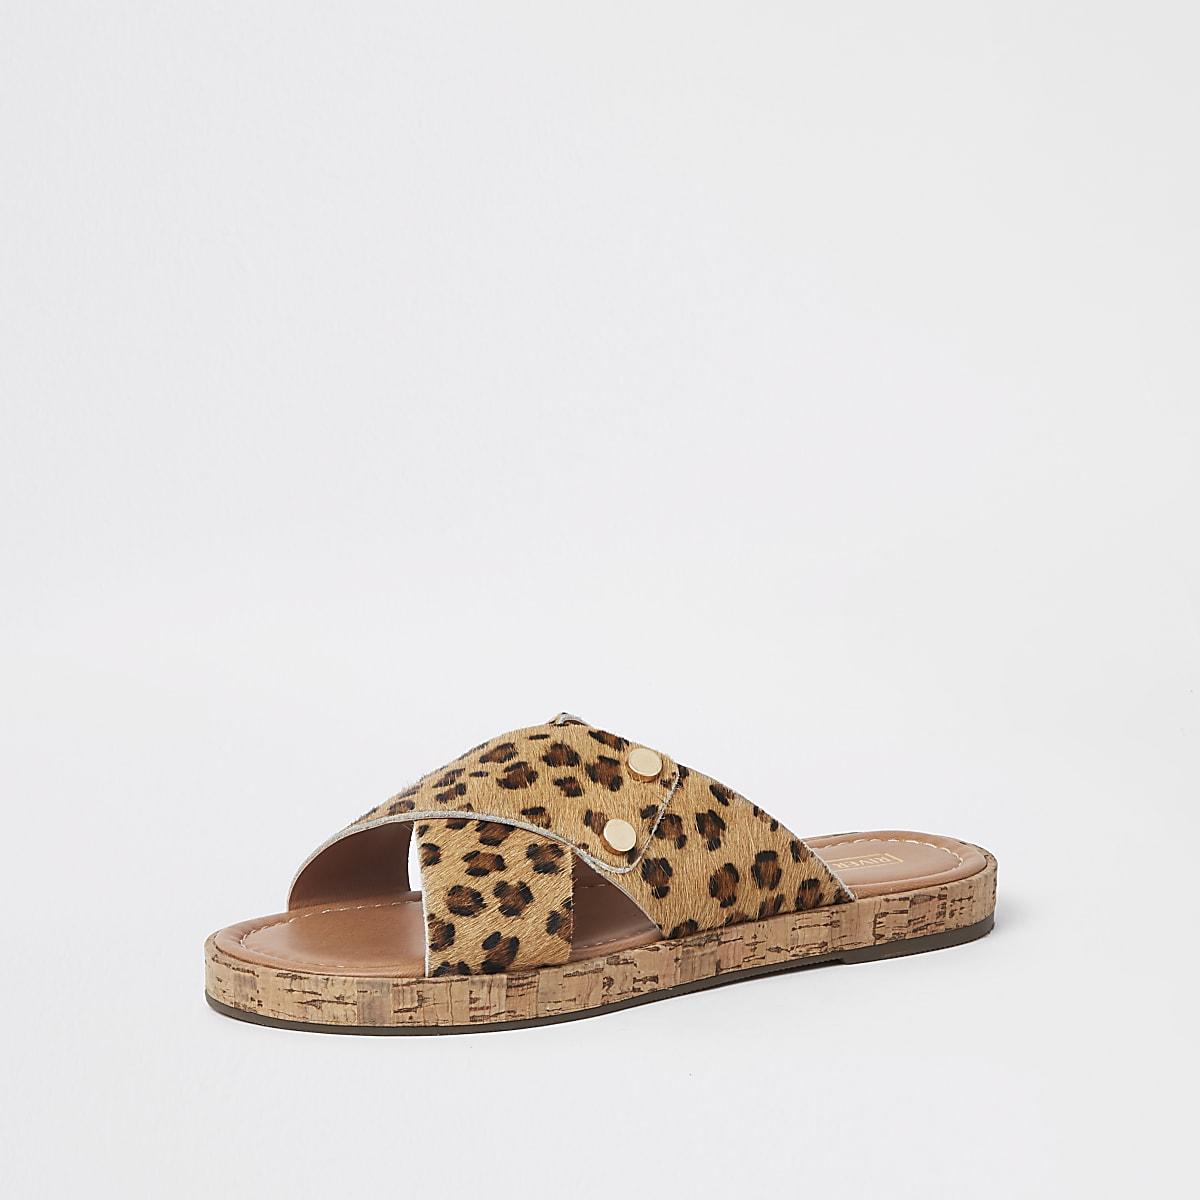 85daaf207ea0 Brown suede leopard cross strap sandals - Sandals - Shoes & Boots ...